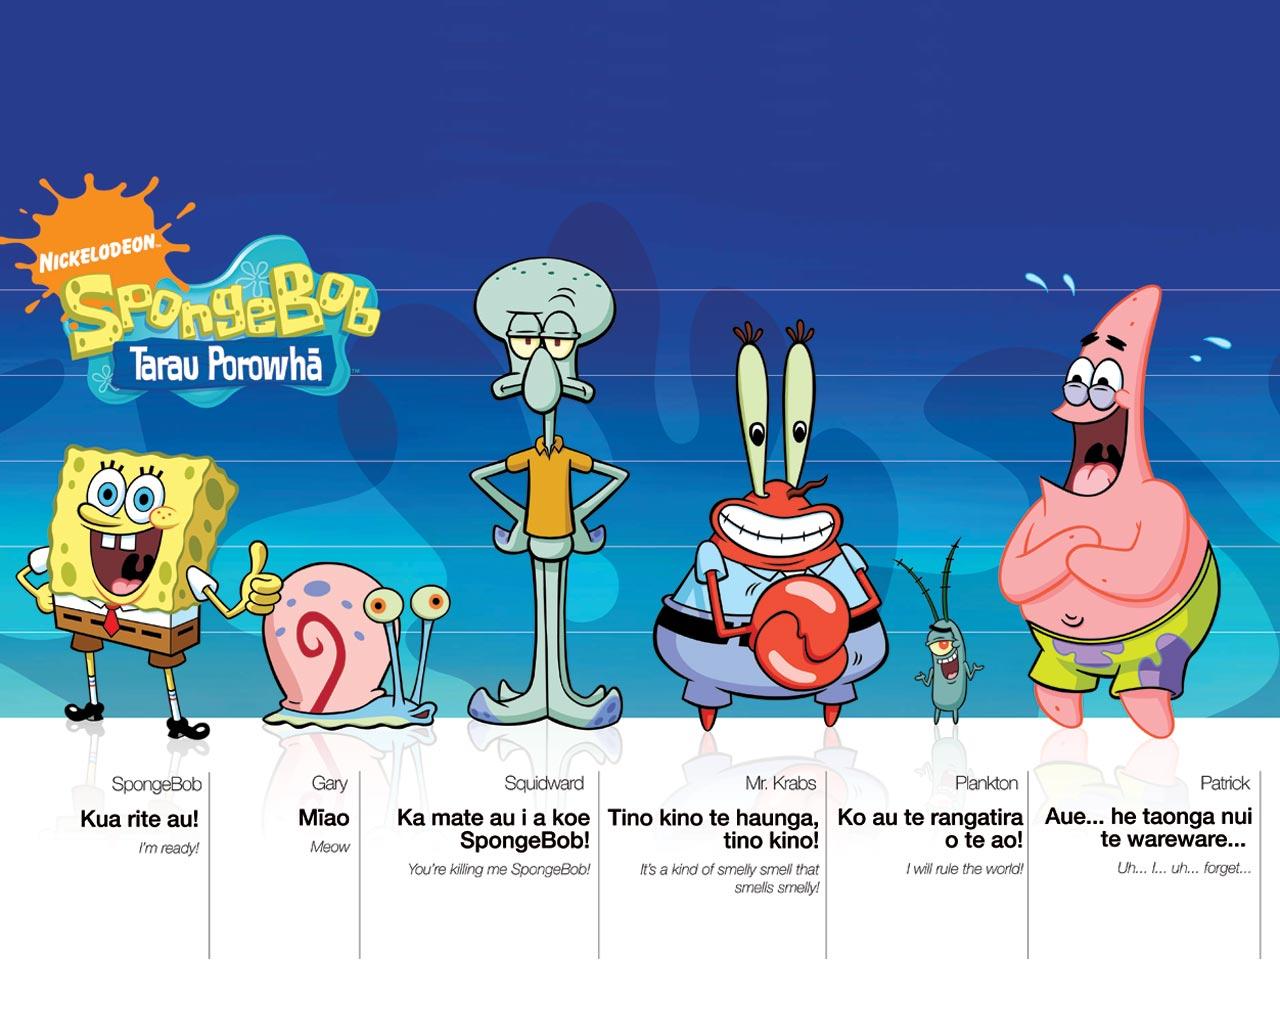 http://2.bp.blogspot.com/-RSDRnCd3APk/UL9Ez38PAiI/AAAAAAAAASQ/SoXM7GuMEME/s1600/Spongebob-Squidward-Mr-krab-Plankton-and-Patrick-WALLPAPER-spongebob-squarepants-31037928-1280-1024.jpg